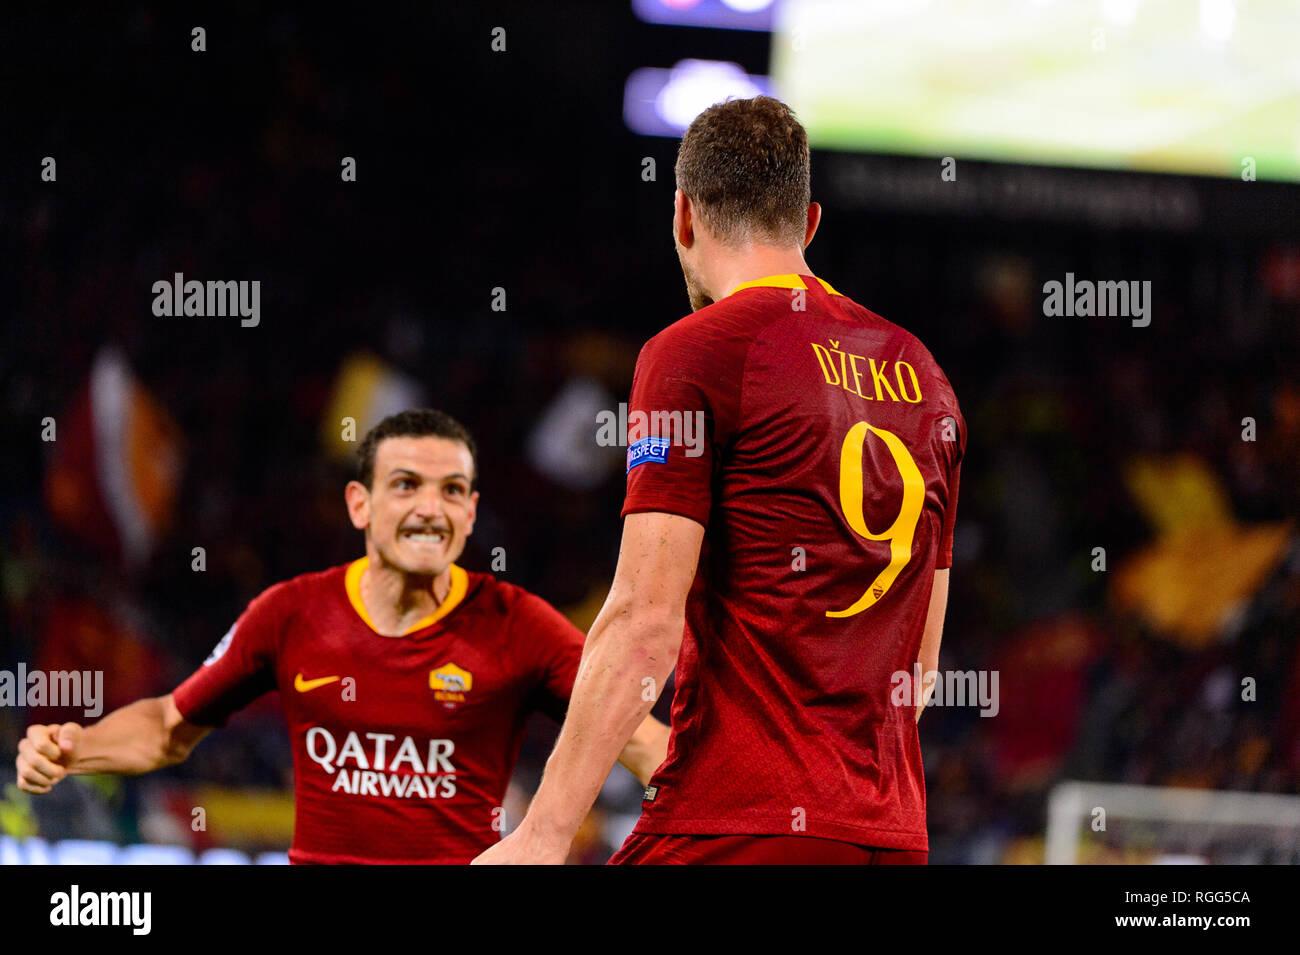 ROME - OCT 23, 2018:  Edin Dzeko celebrates the goal he scored. AS Roma - CSKA Moscow. UEFA Champions league. Matchday 4. Stadio Olimpico - Stock Image